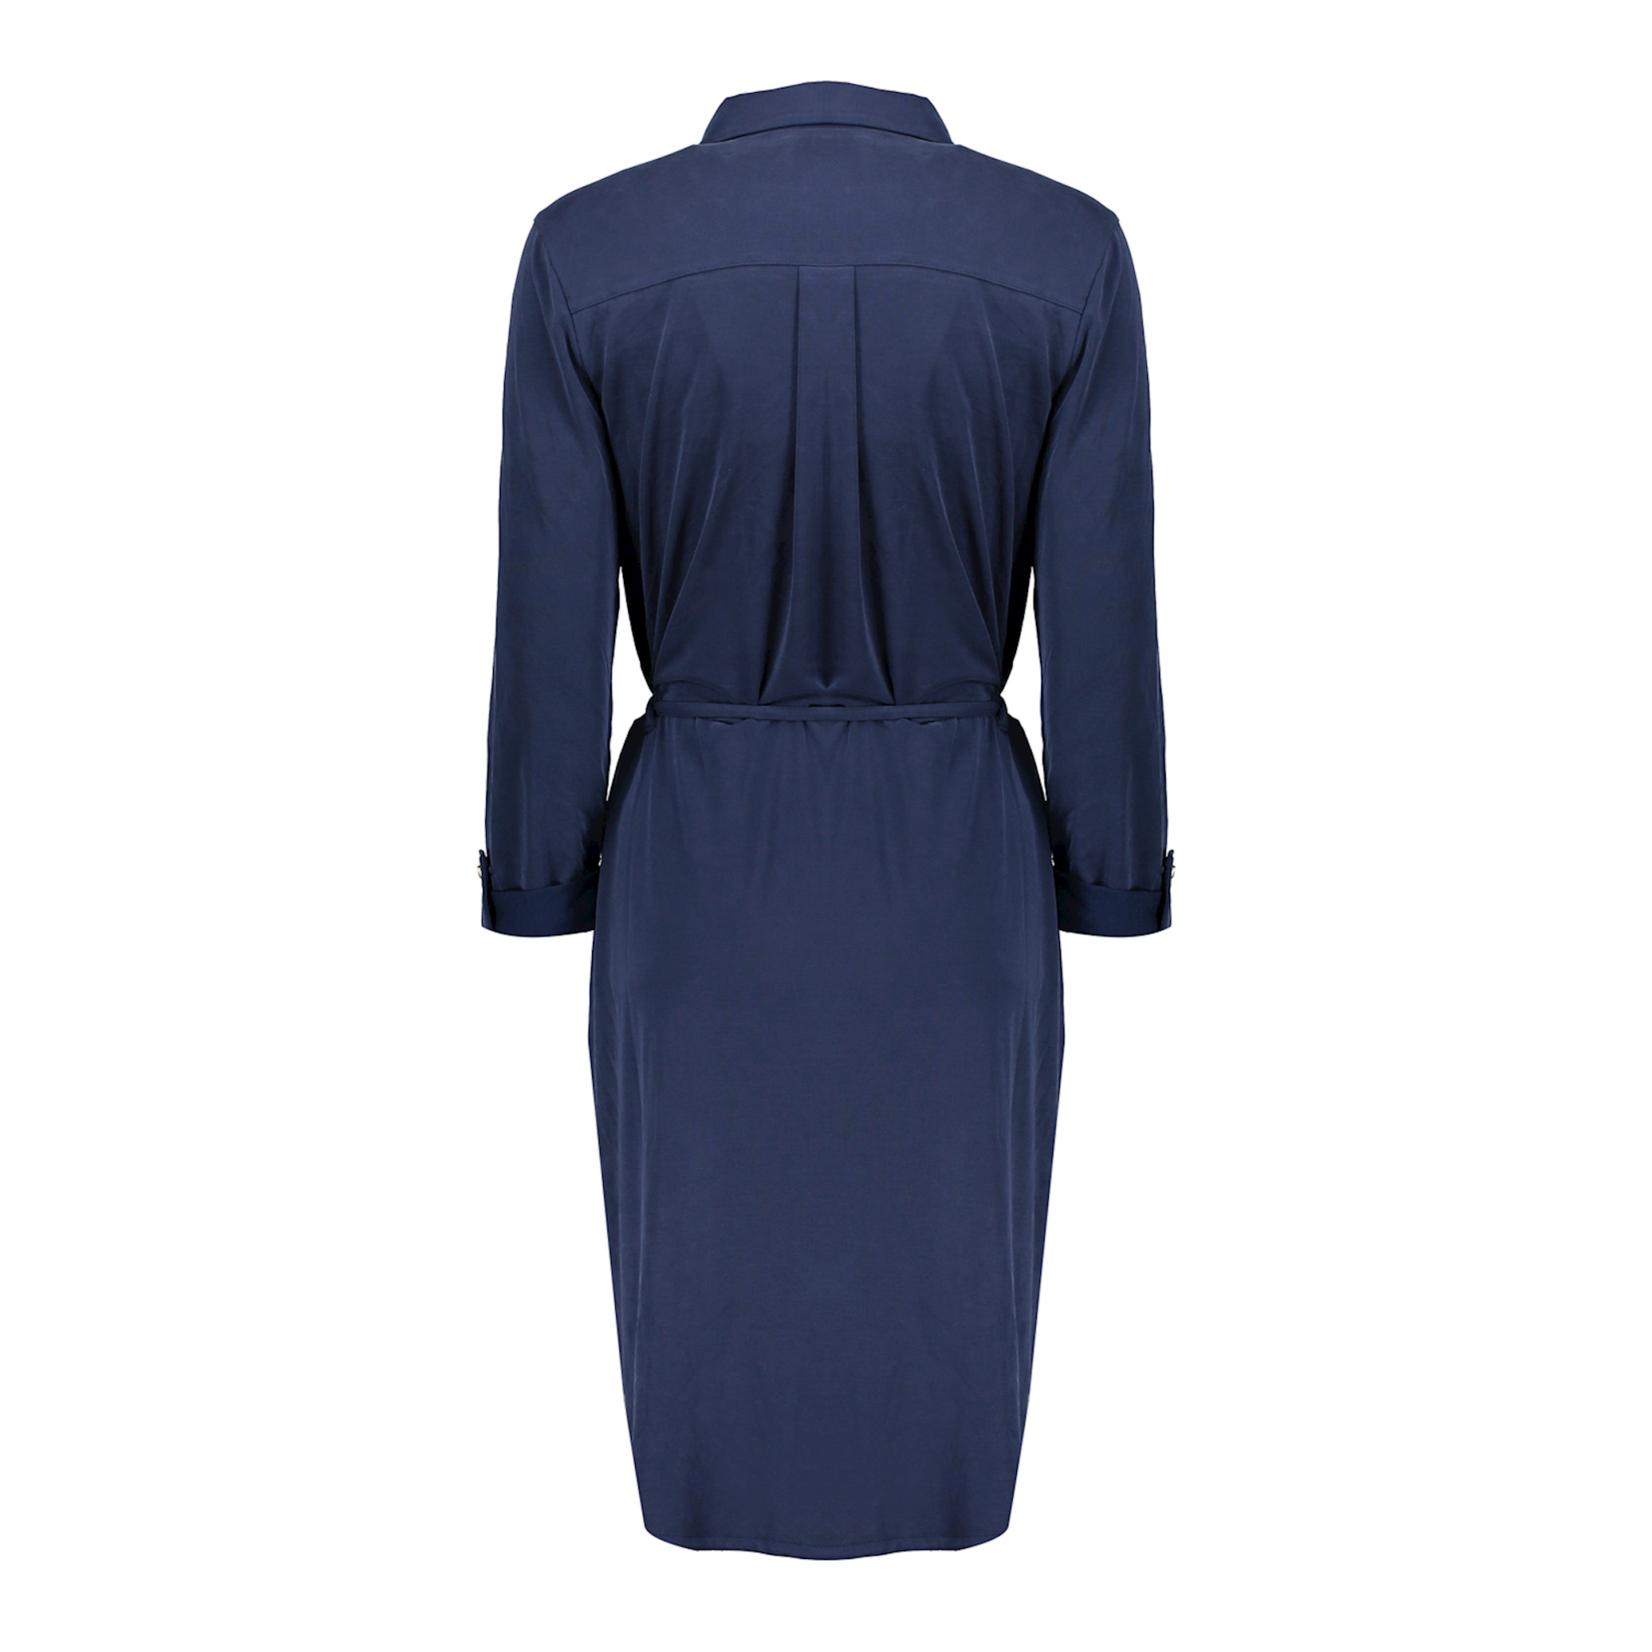 Geisha Geisha dress button closure , strap&pockets 17005-10